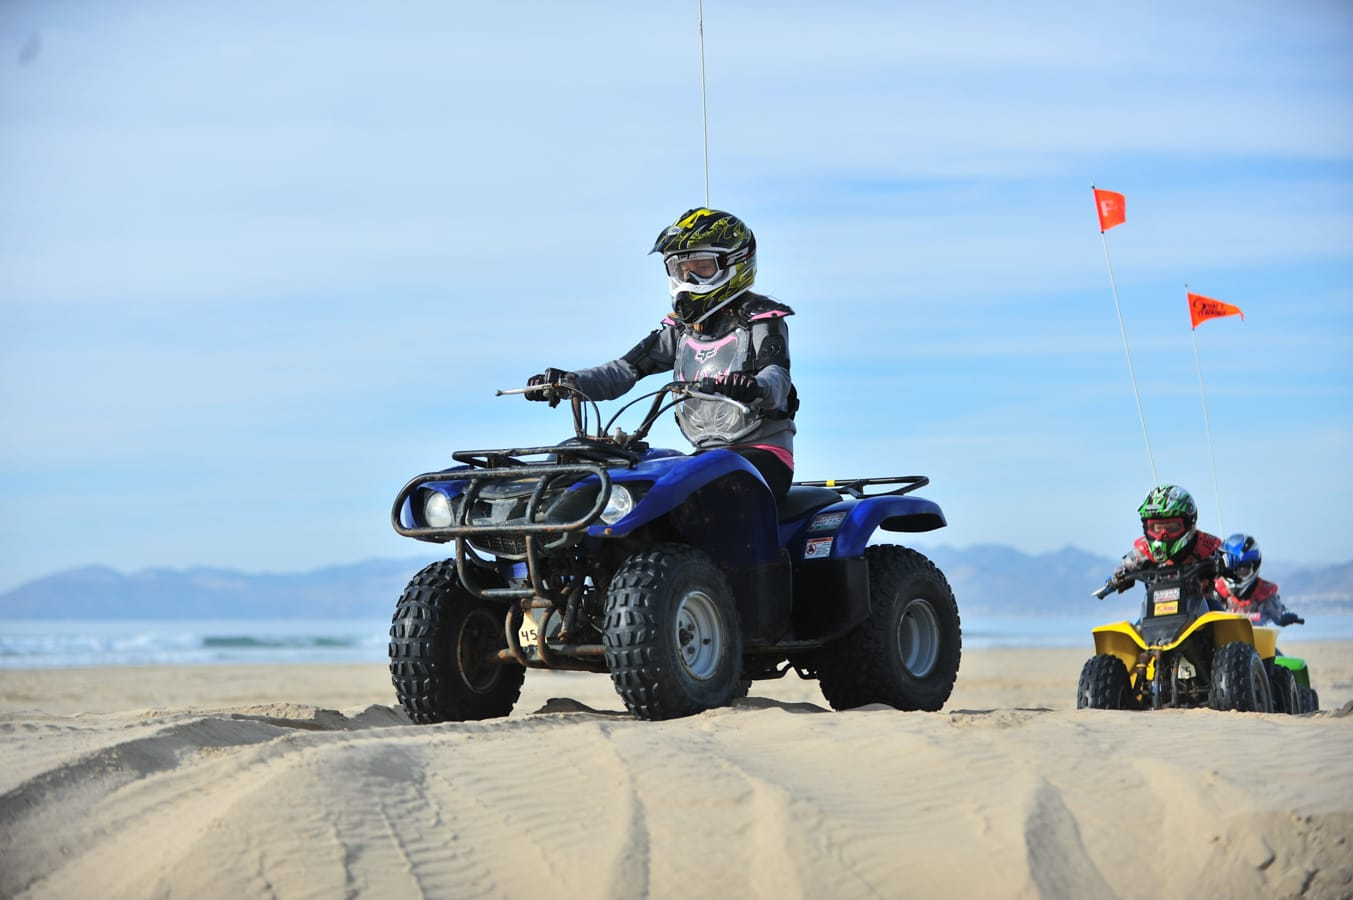 Guest riding a Steve's ATV rental